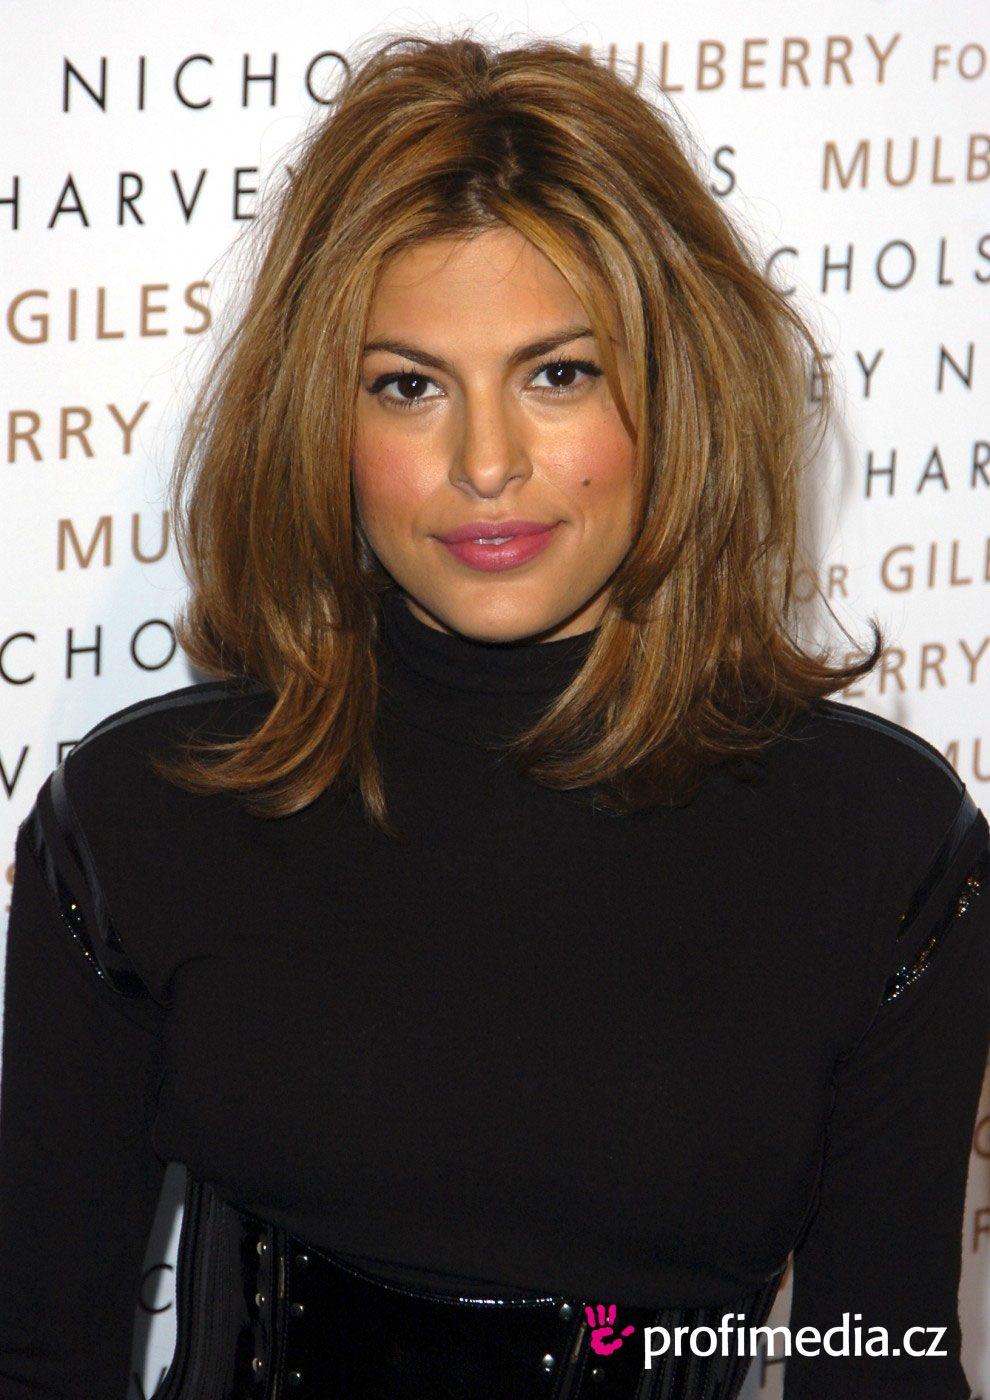 Eva Mendes Hairstyle Easyhairstyler Hair Styles Eva Mendes Hair Hair Lengths